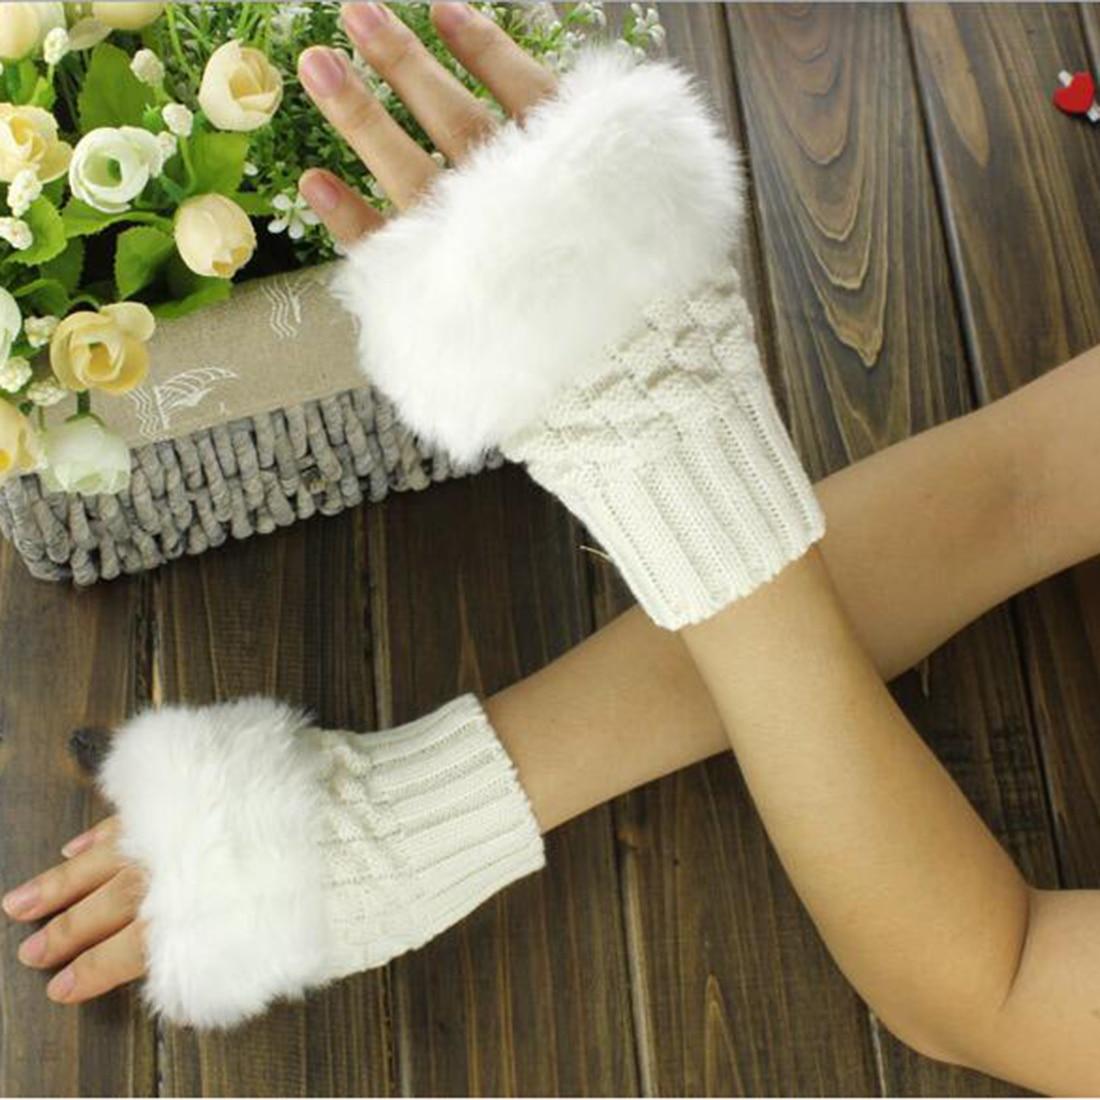 2017 Fashion Women Fingerless Gloves Cute Faux Rabbit Fur Knitted Gloves Female Winter Knitting Warmer Wrist Hand Gloves Mitten in Women 39 s Gloves from Apparel Accessories